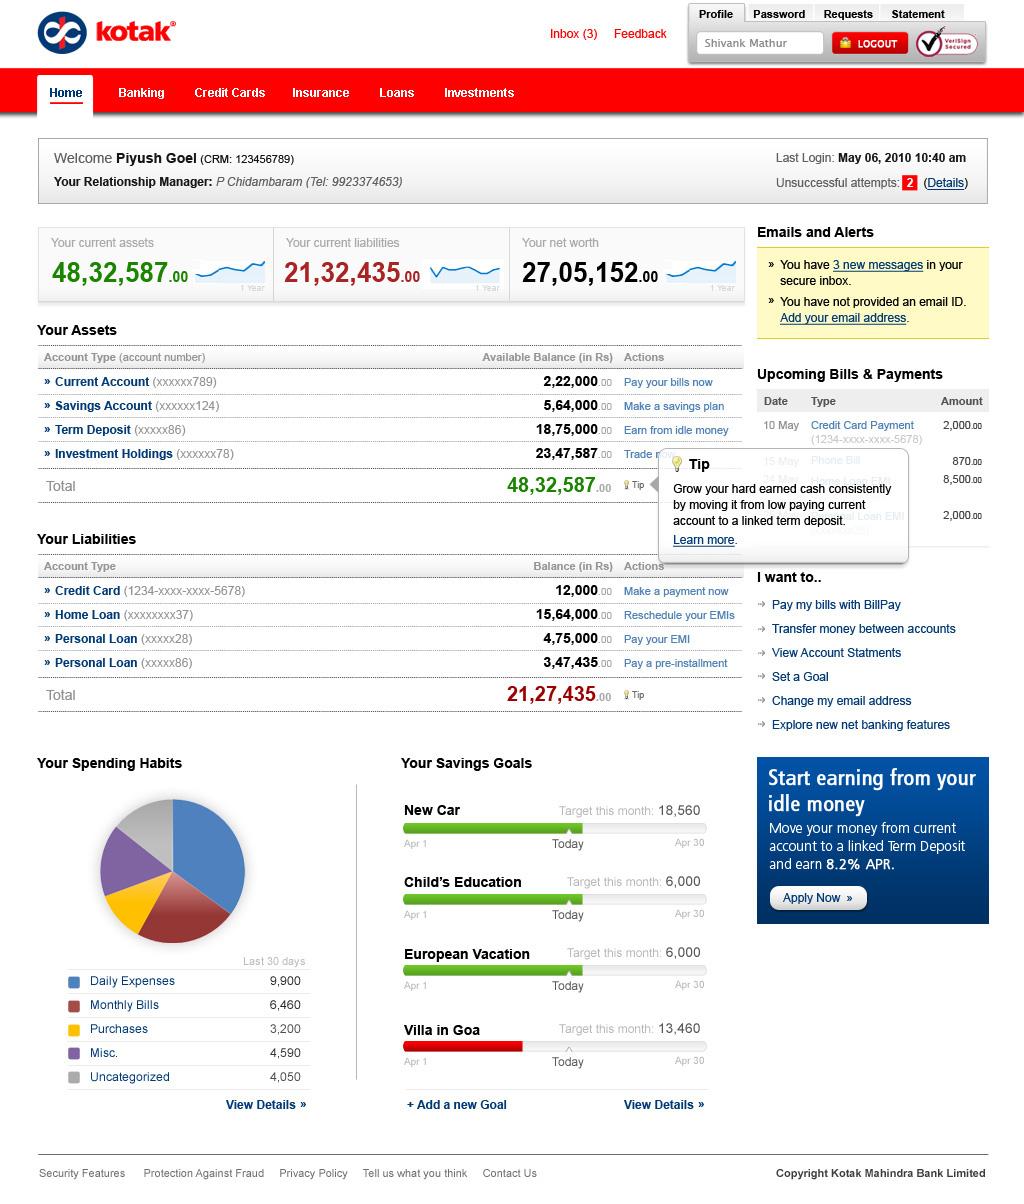 kotak Netbanking web form design india web design india data design